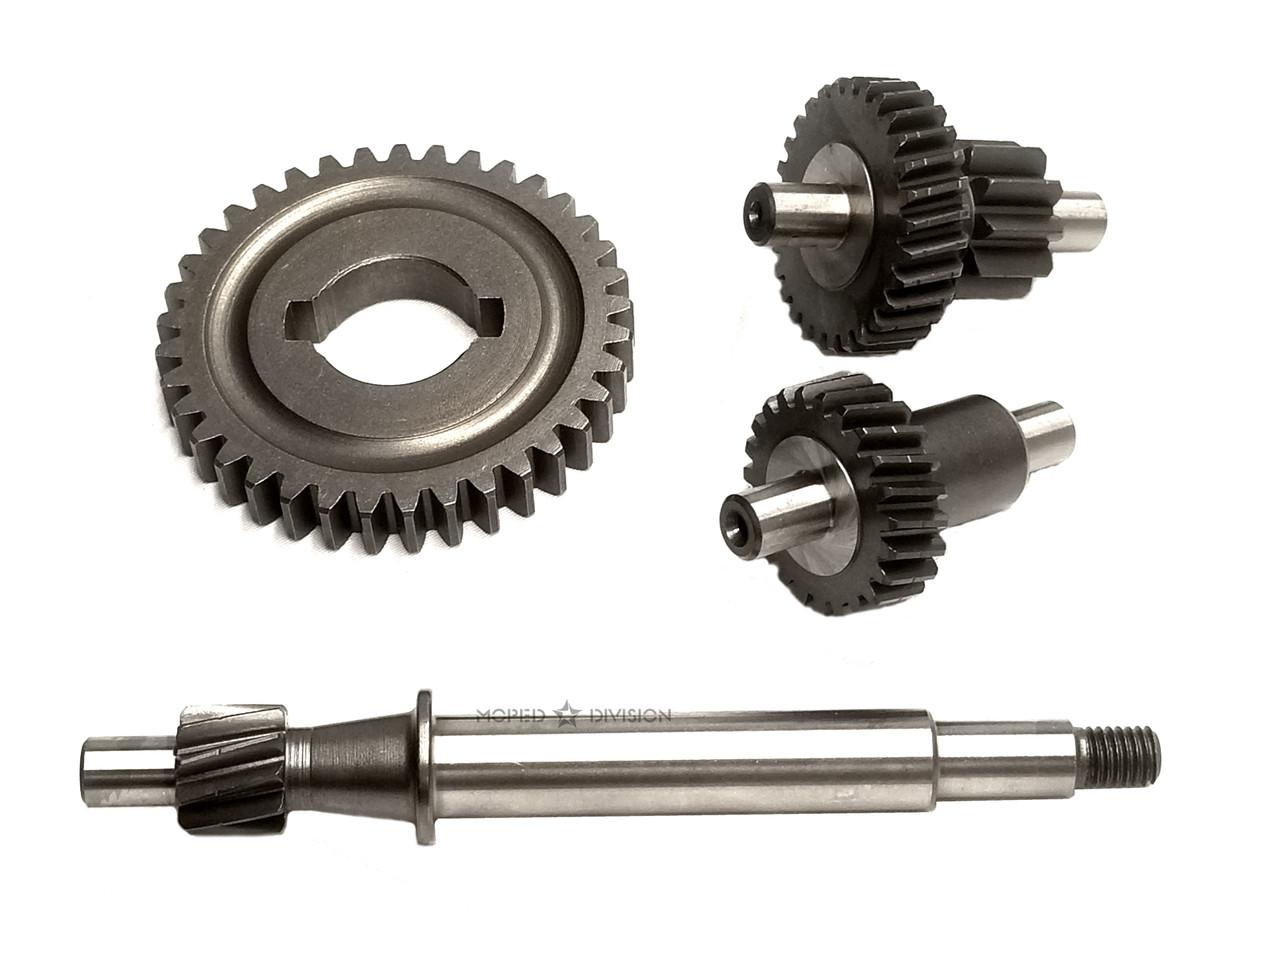 Vespa Piaggio Variated Hardened Gear Set - Stock 10.7:1